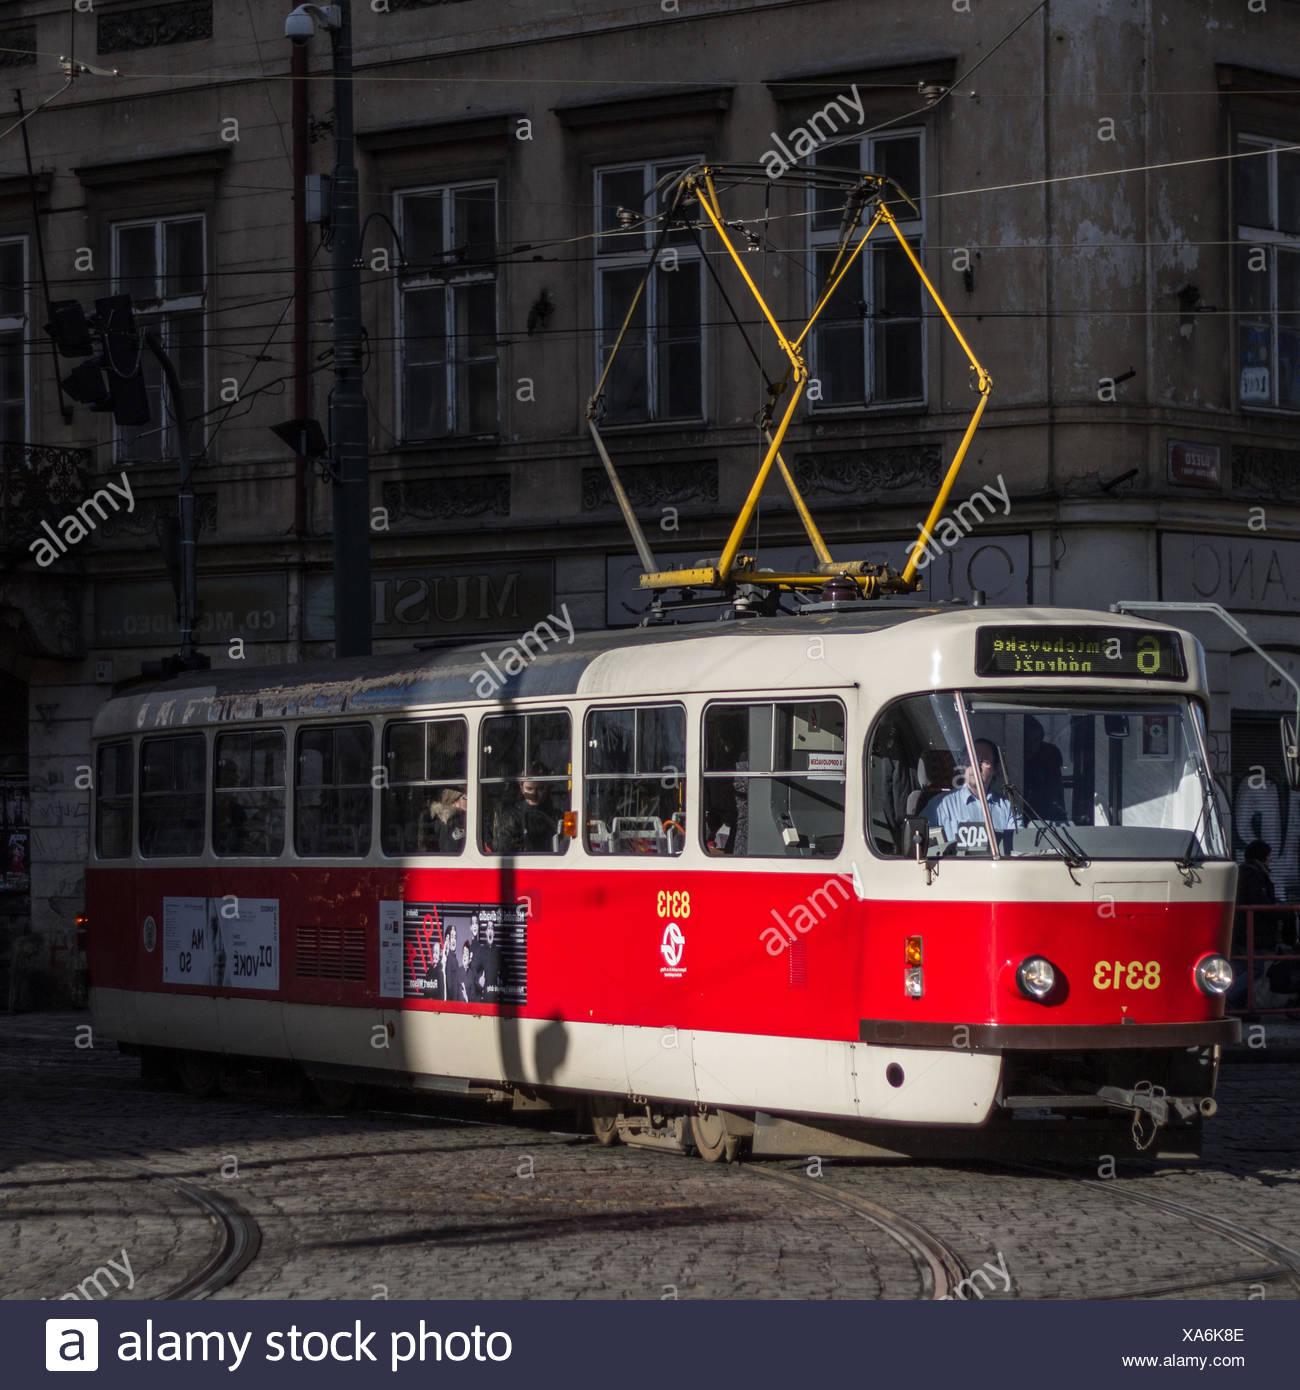 Nostalgic Tram in Prague - Stock Image